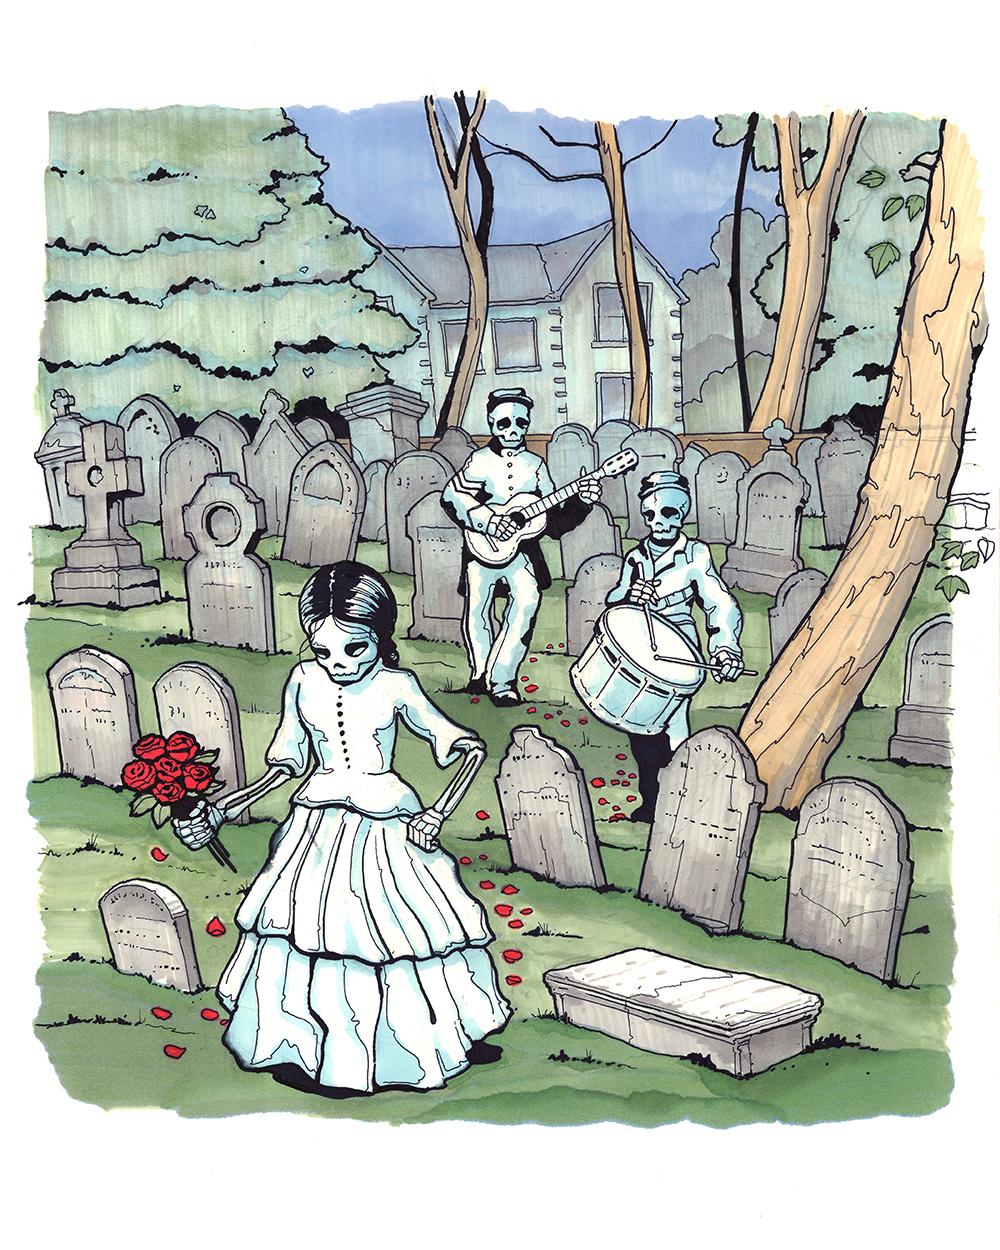 La-Guerre-Skeletons-Web.jpg